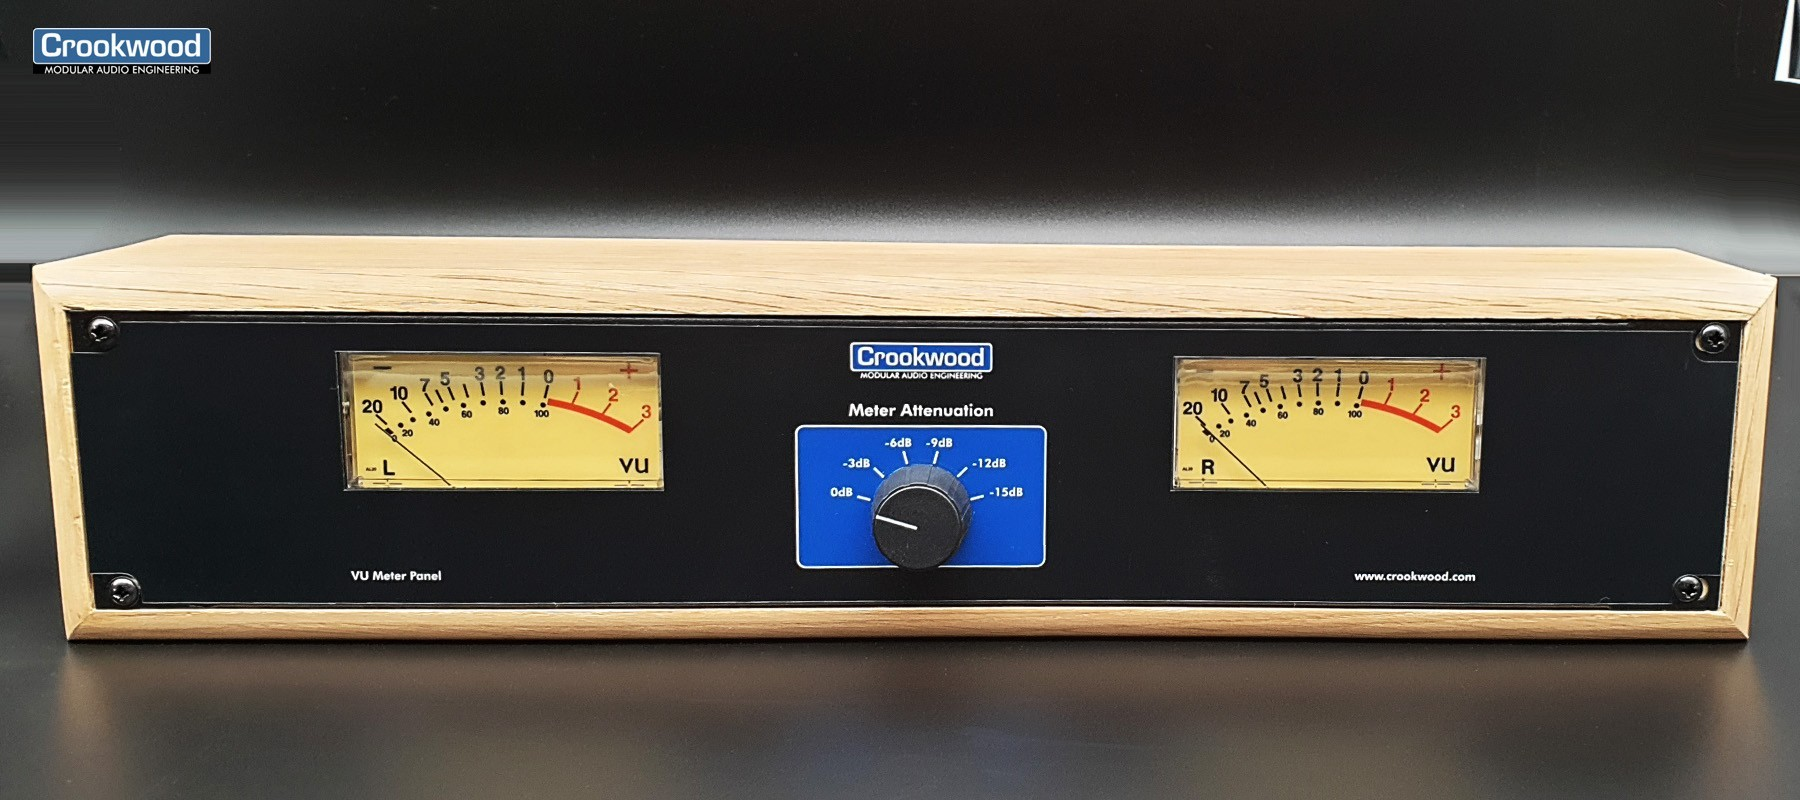 Crookwwod Vu mètre stéréo avec rack en bois